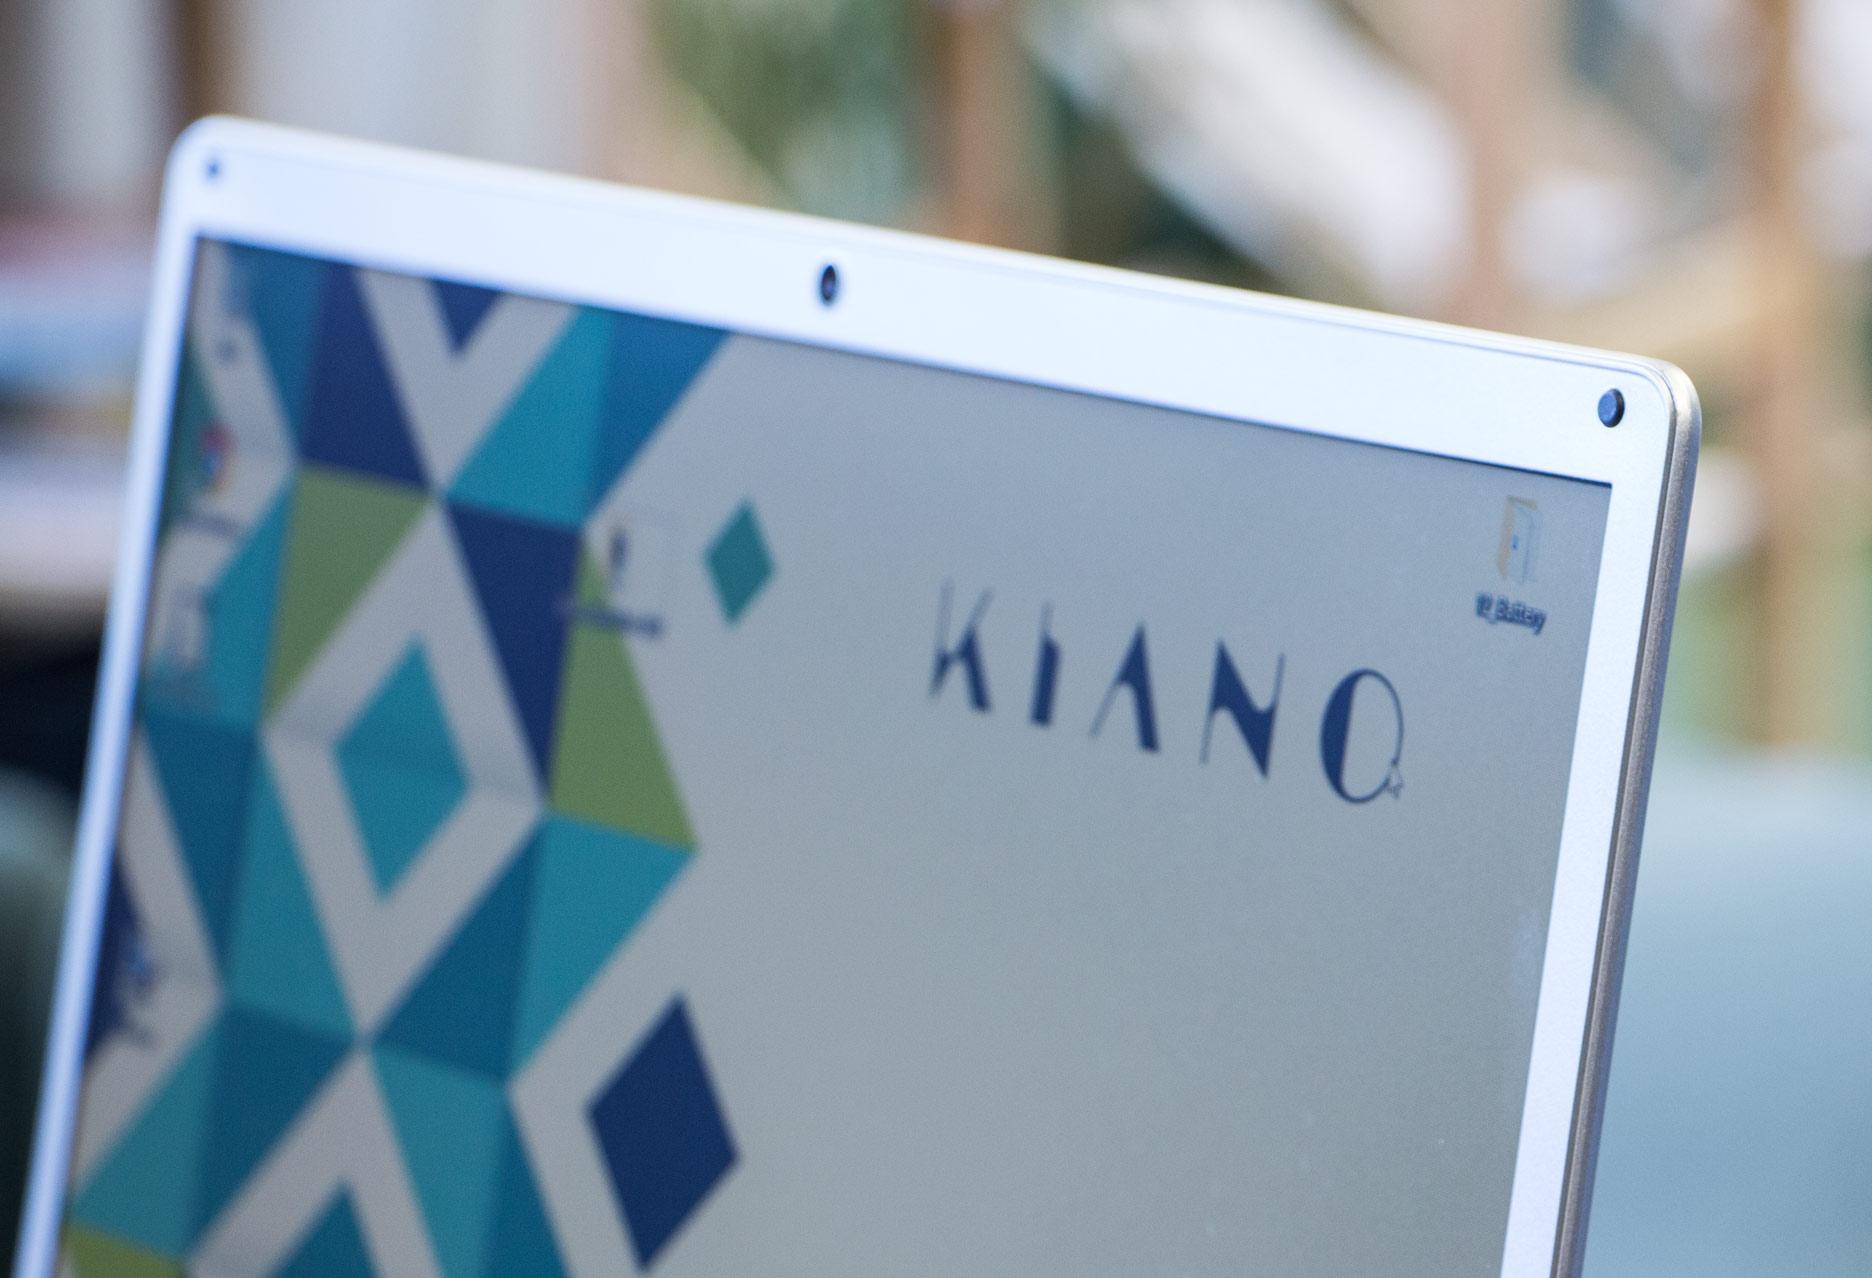 Kiano SlimNote 14.2+ ramka ekranu